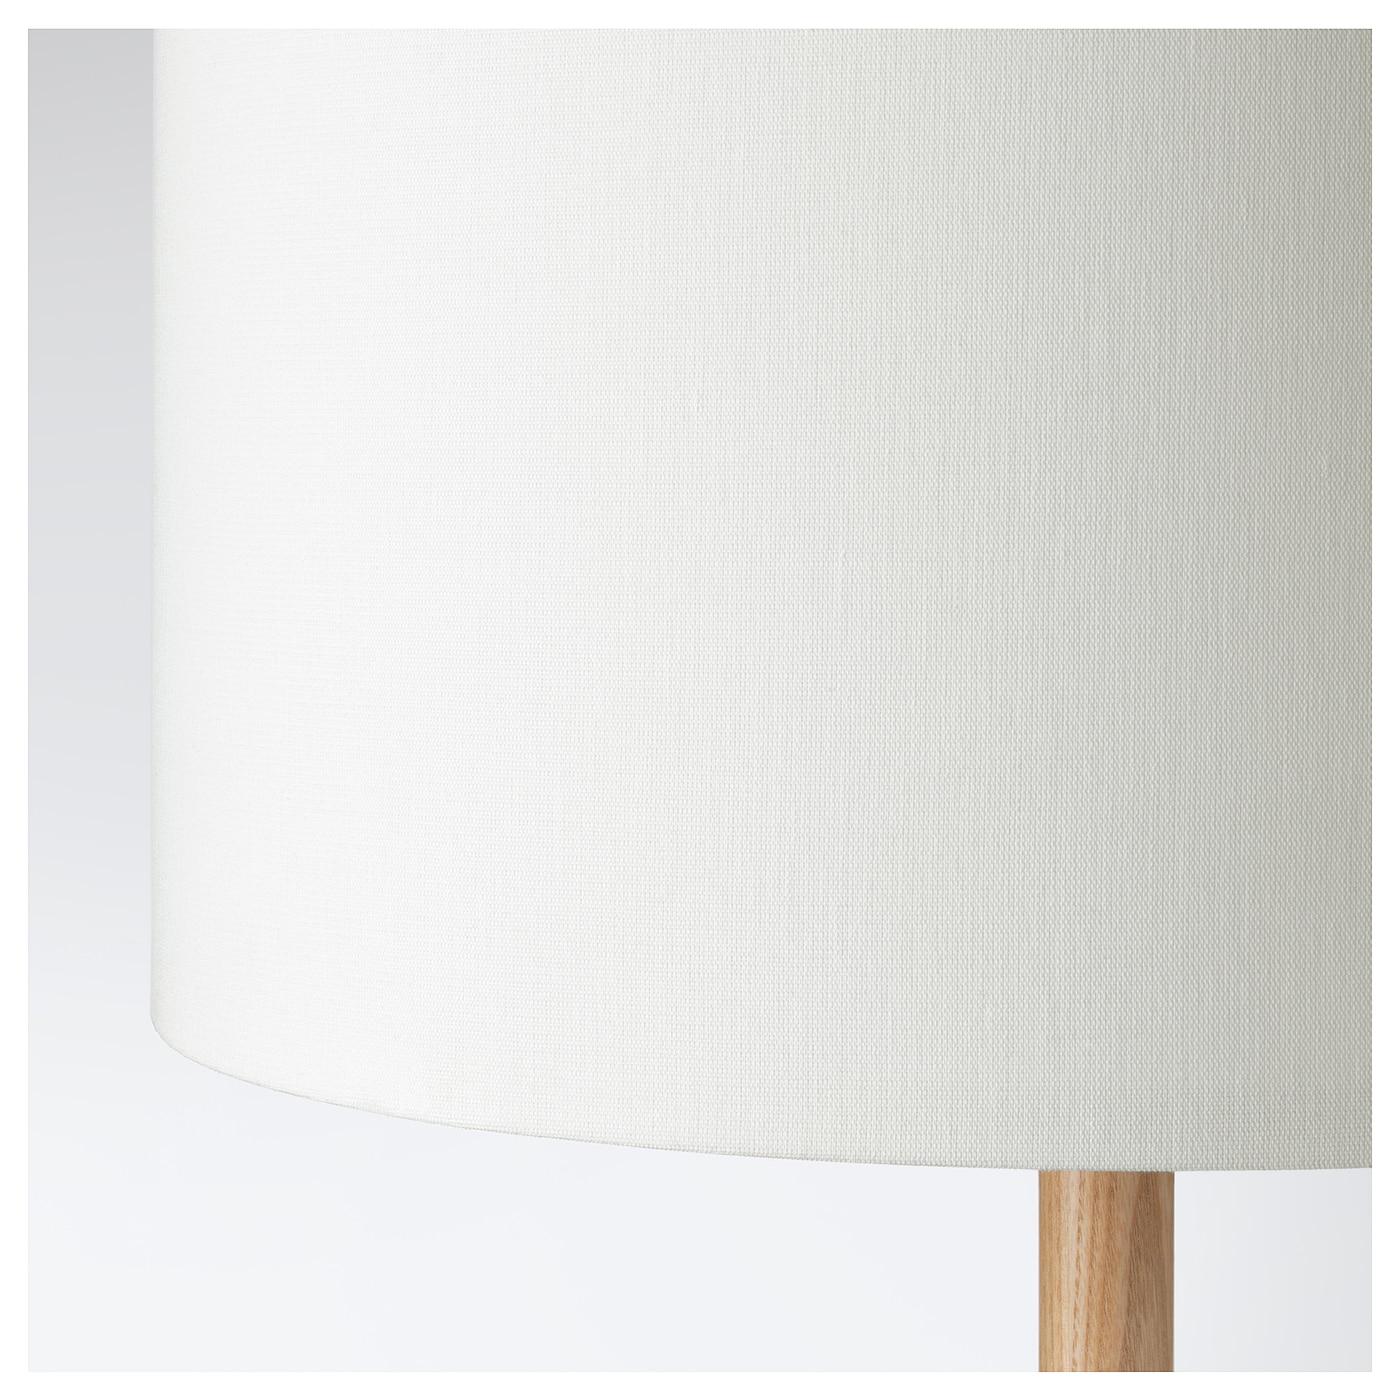 Full Size of Ikea Stehlampe Holz Lauters Standleuchte Esche Bett Massivholz Holzhaus Garten Betten Aus Küche Weiß 160x200 Spielhaus Regal Esstisch Holzplatte Stehlampen Wohnzimmer Ikea Stehlampe Holz